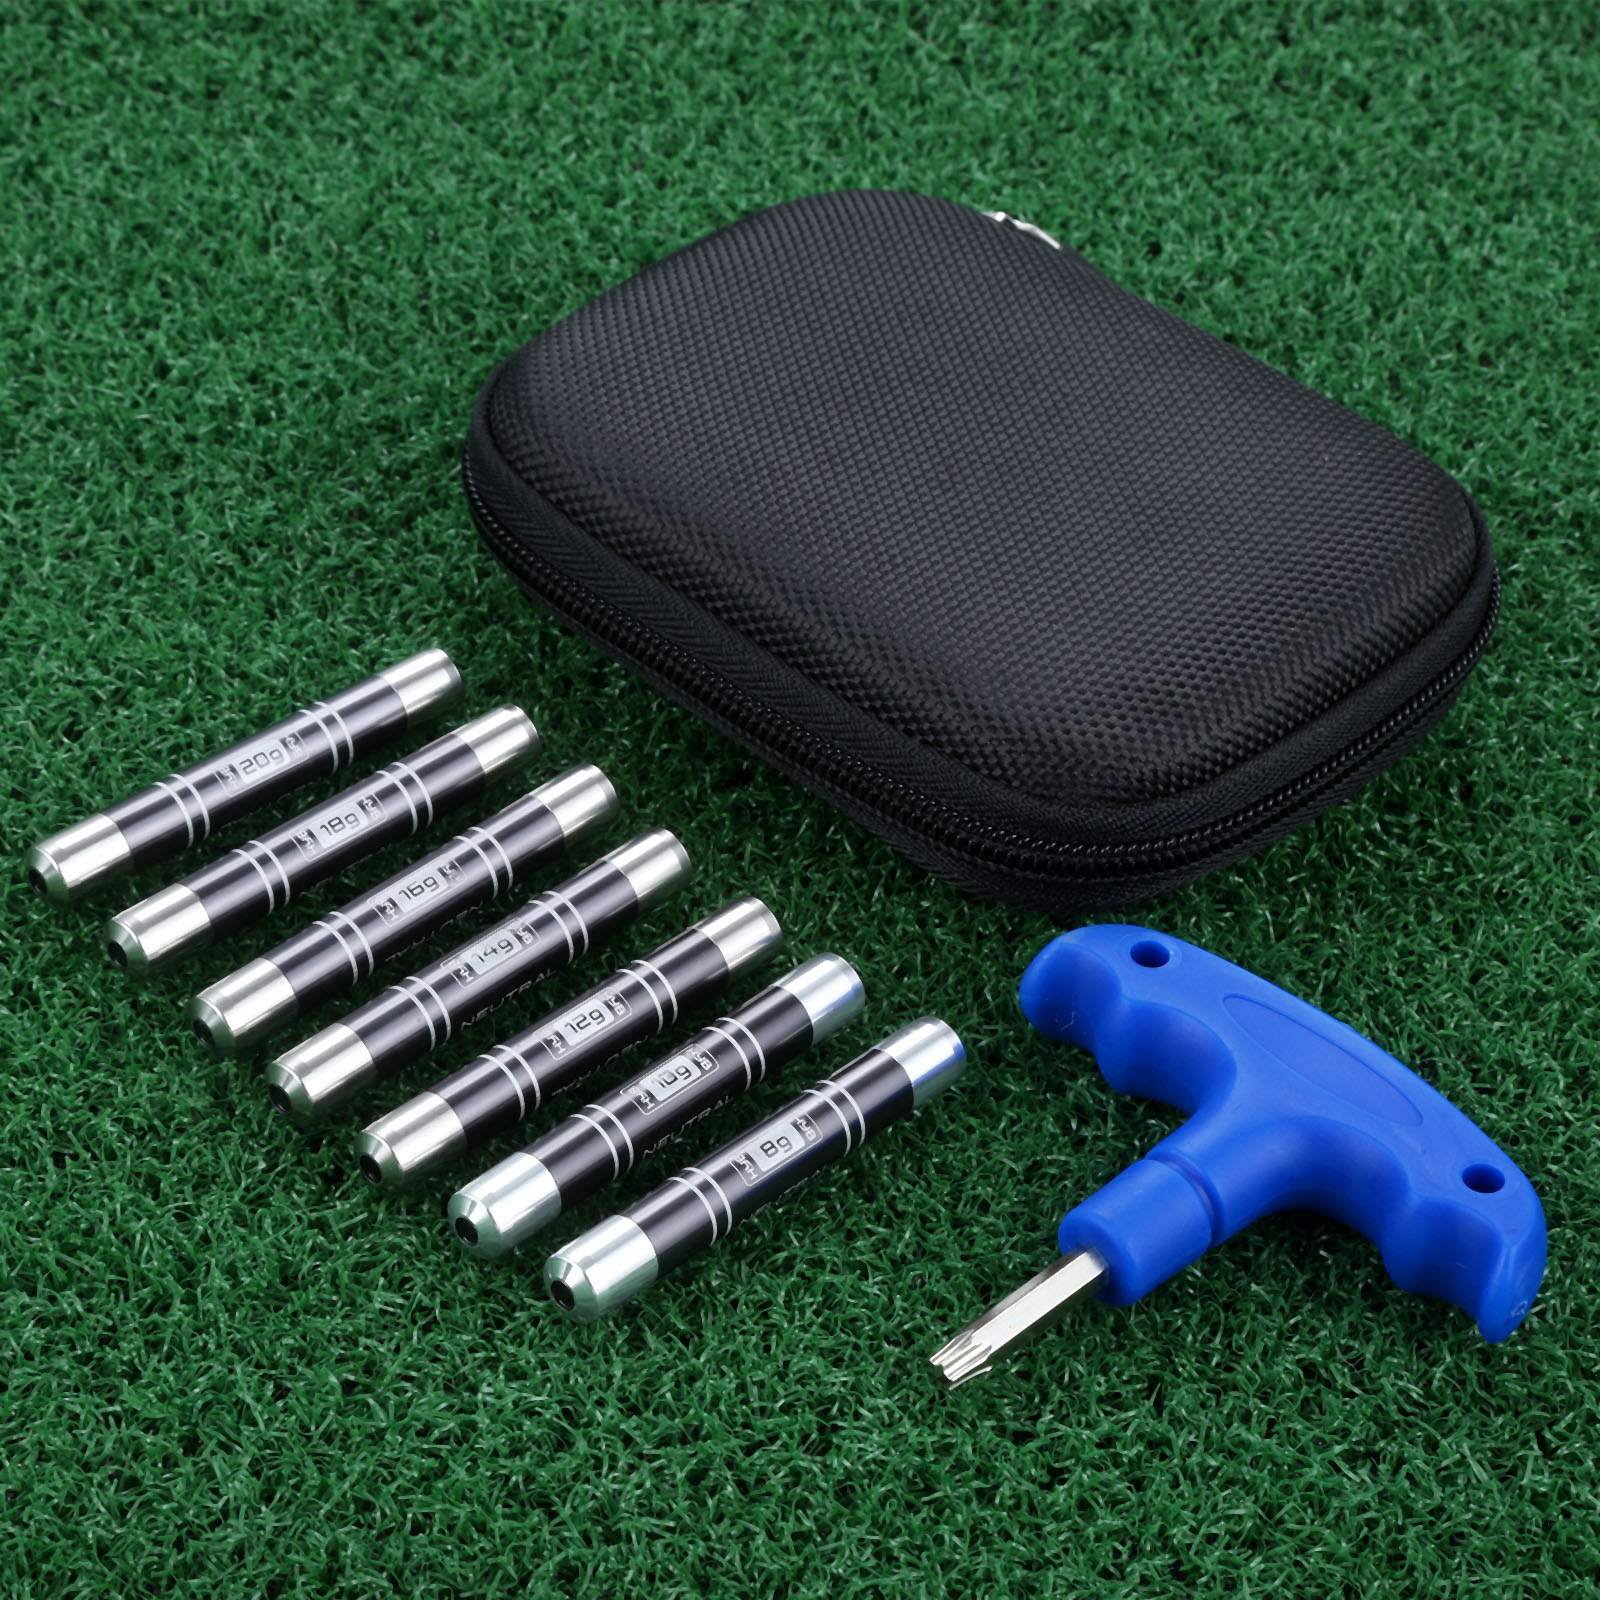 1Set For Titleist 818H NE Driver Fairway Wood Golf Weights Screw Wrench Kit Golf Club Heads Accessory 8g 10g 12g 14g 16g 18g 20g